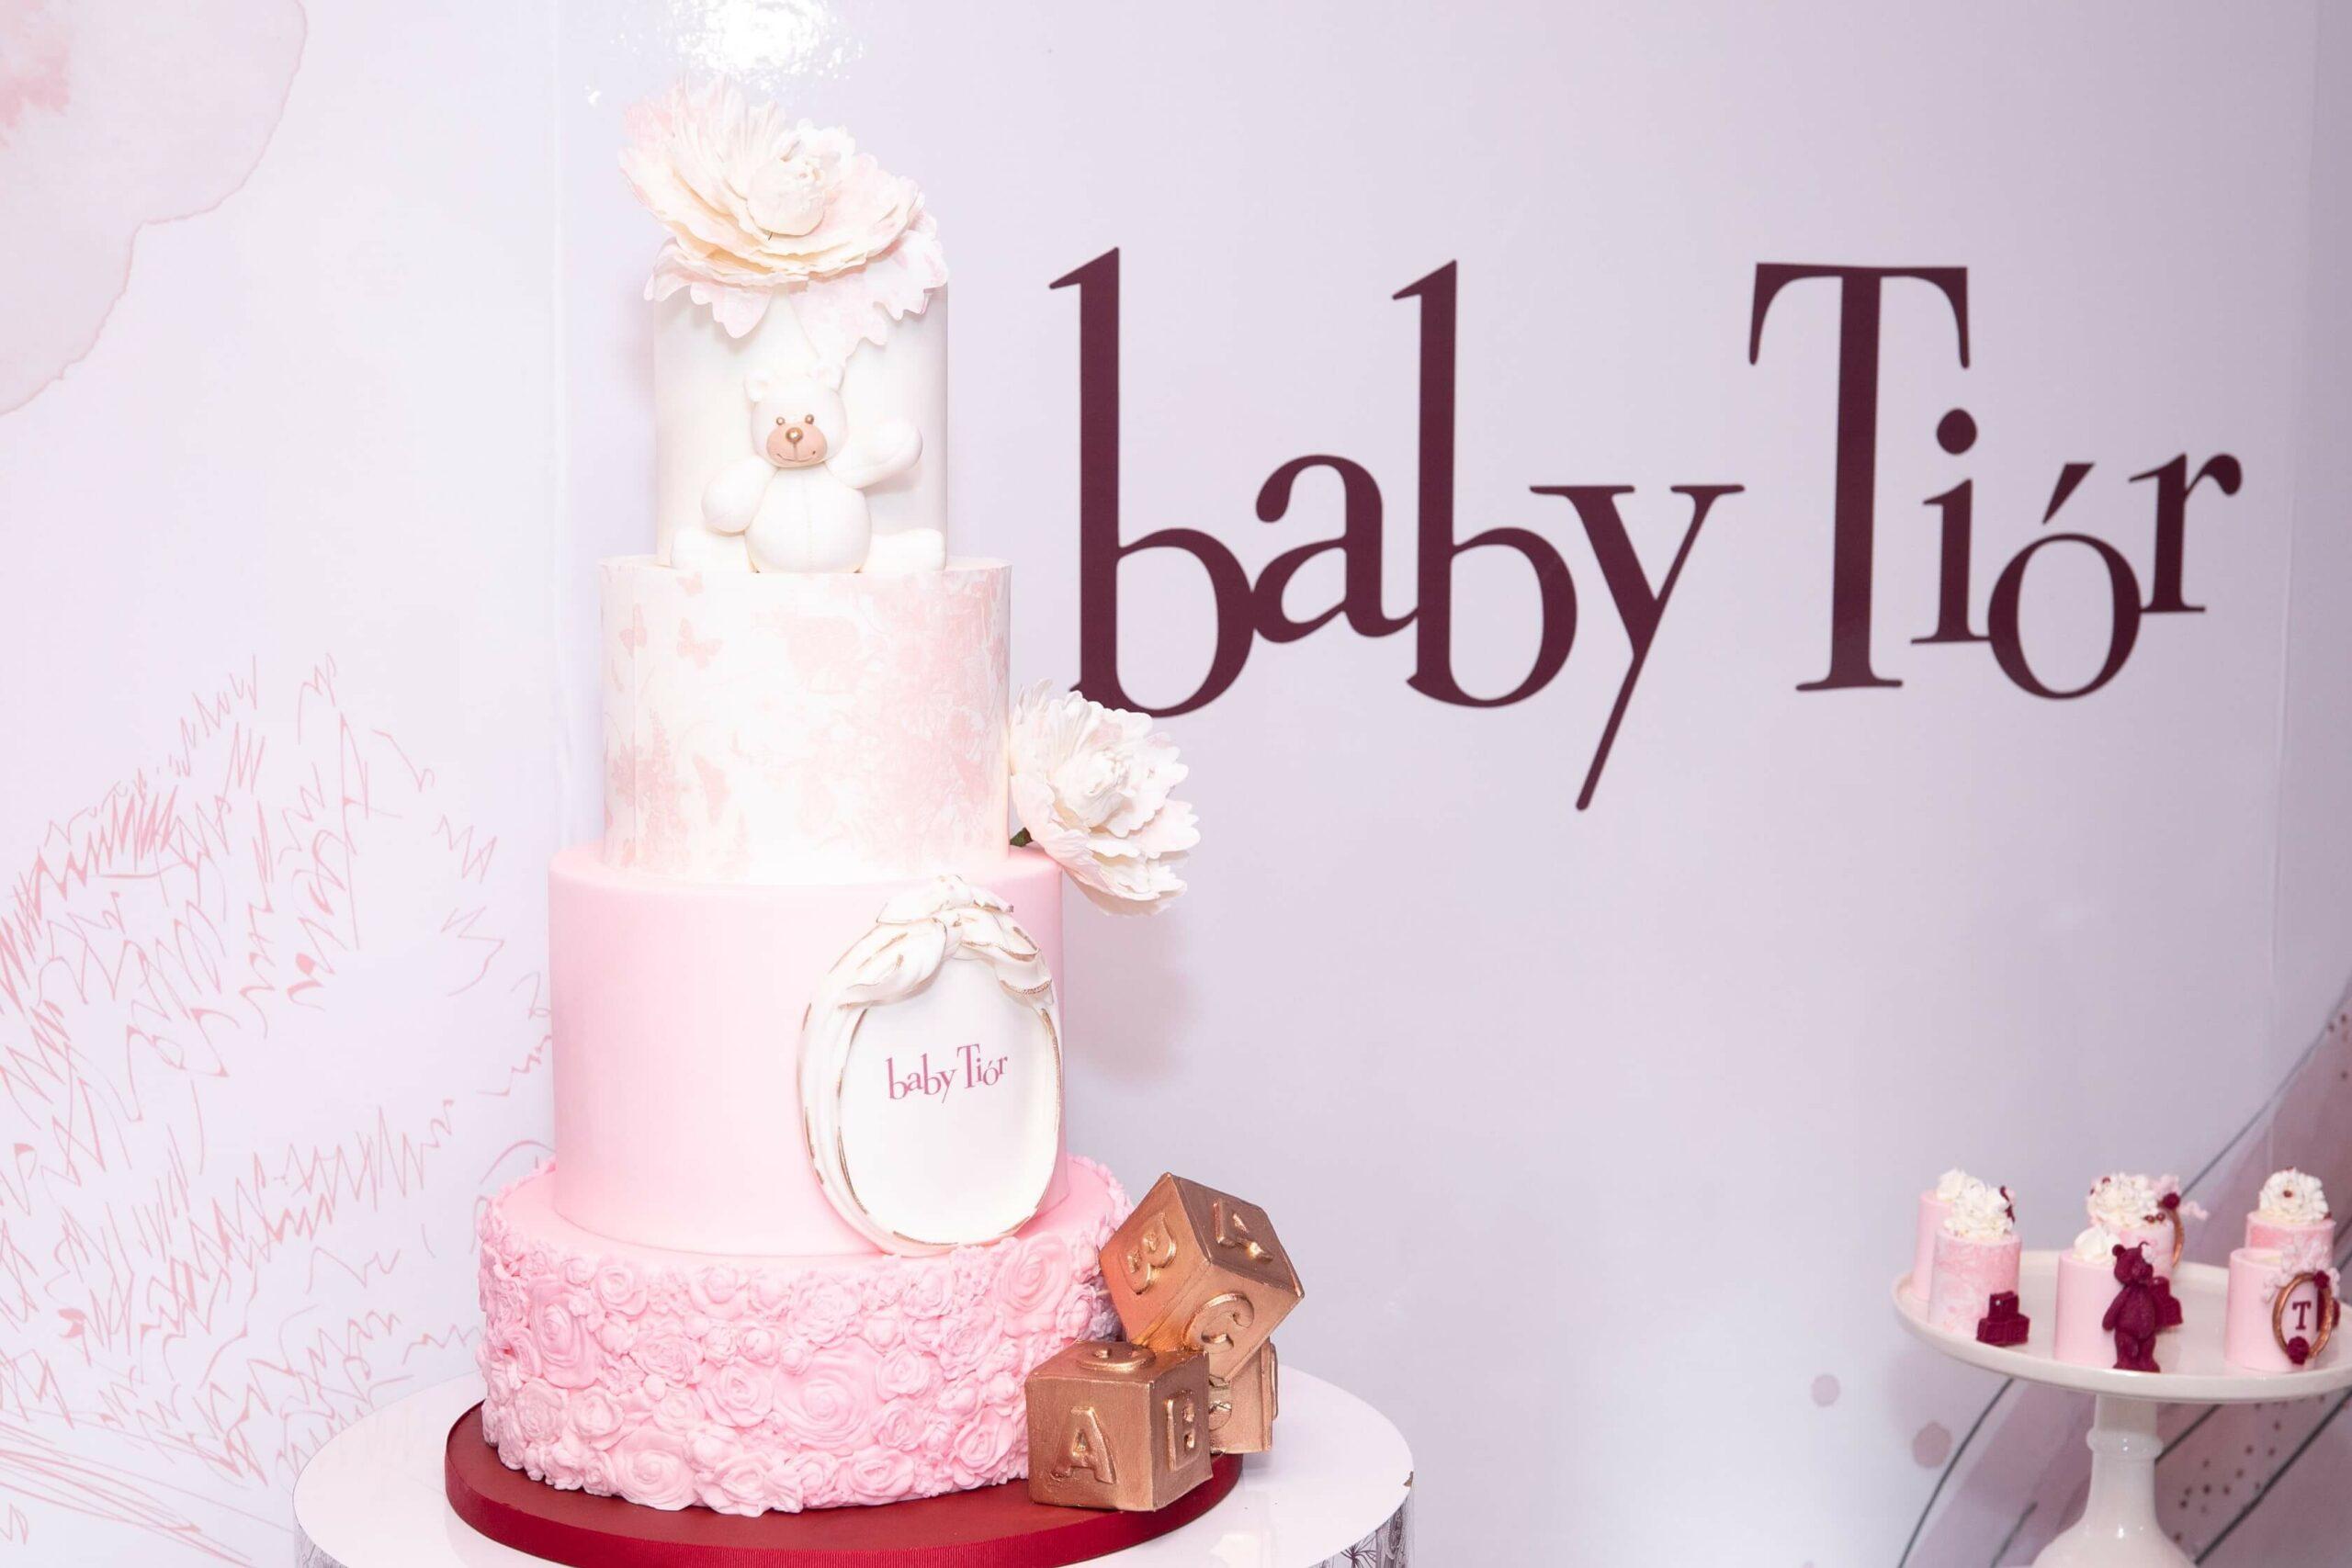 Tior at Dior Baby Shower